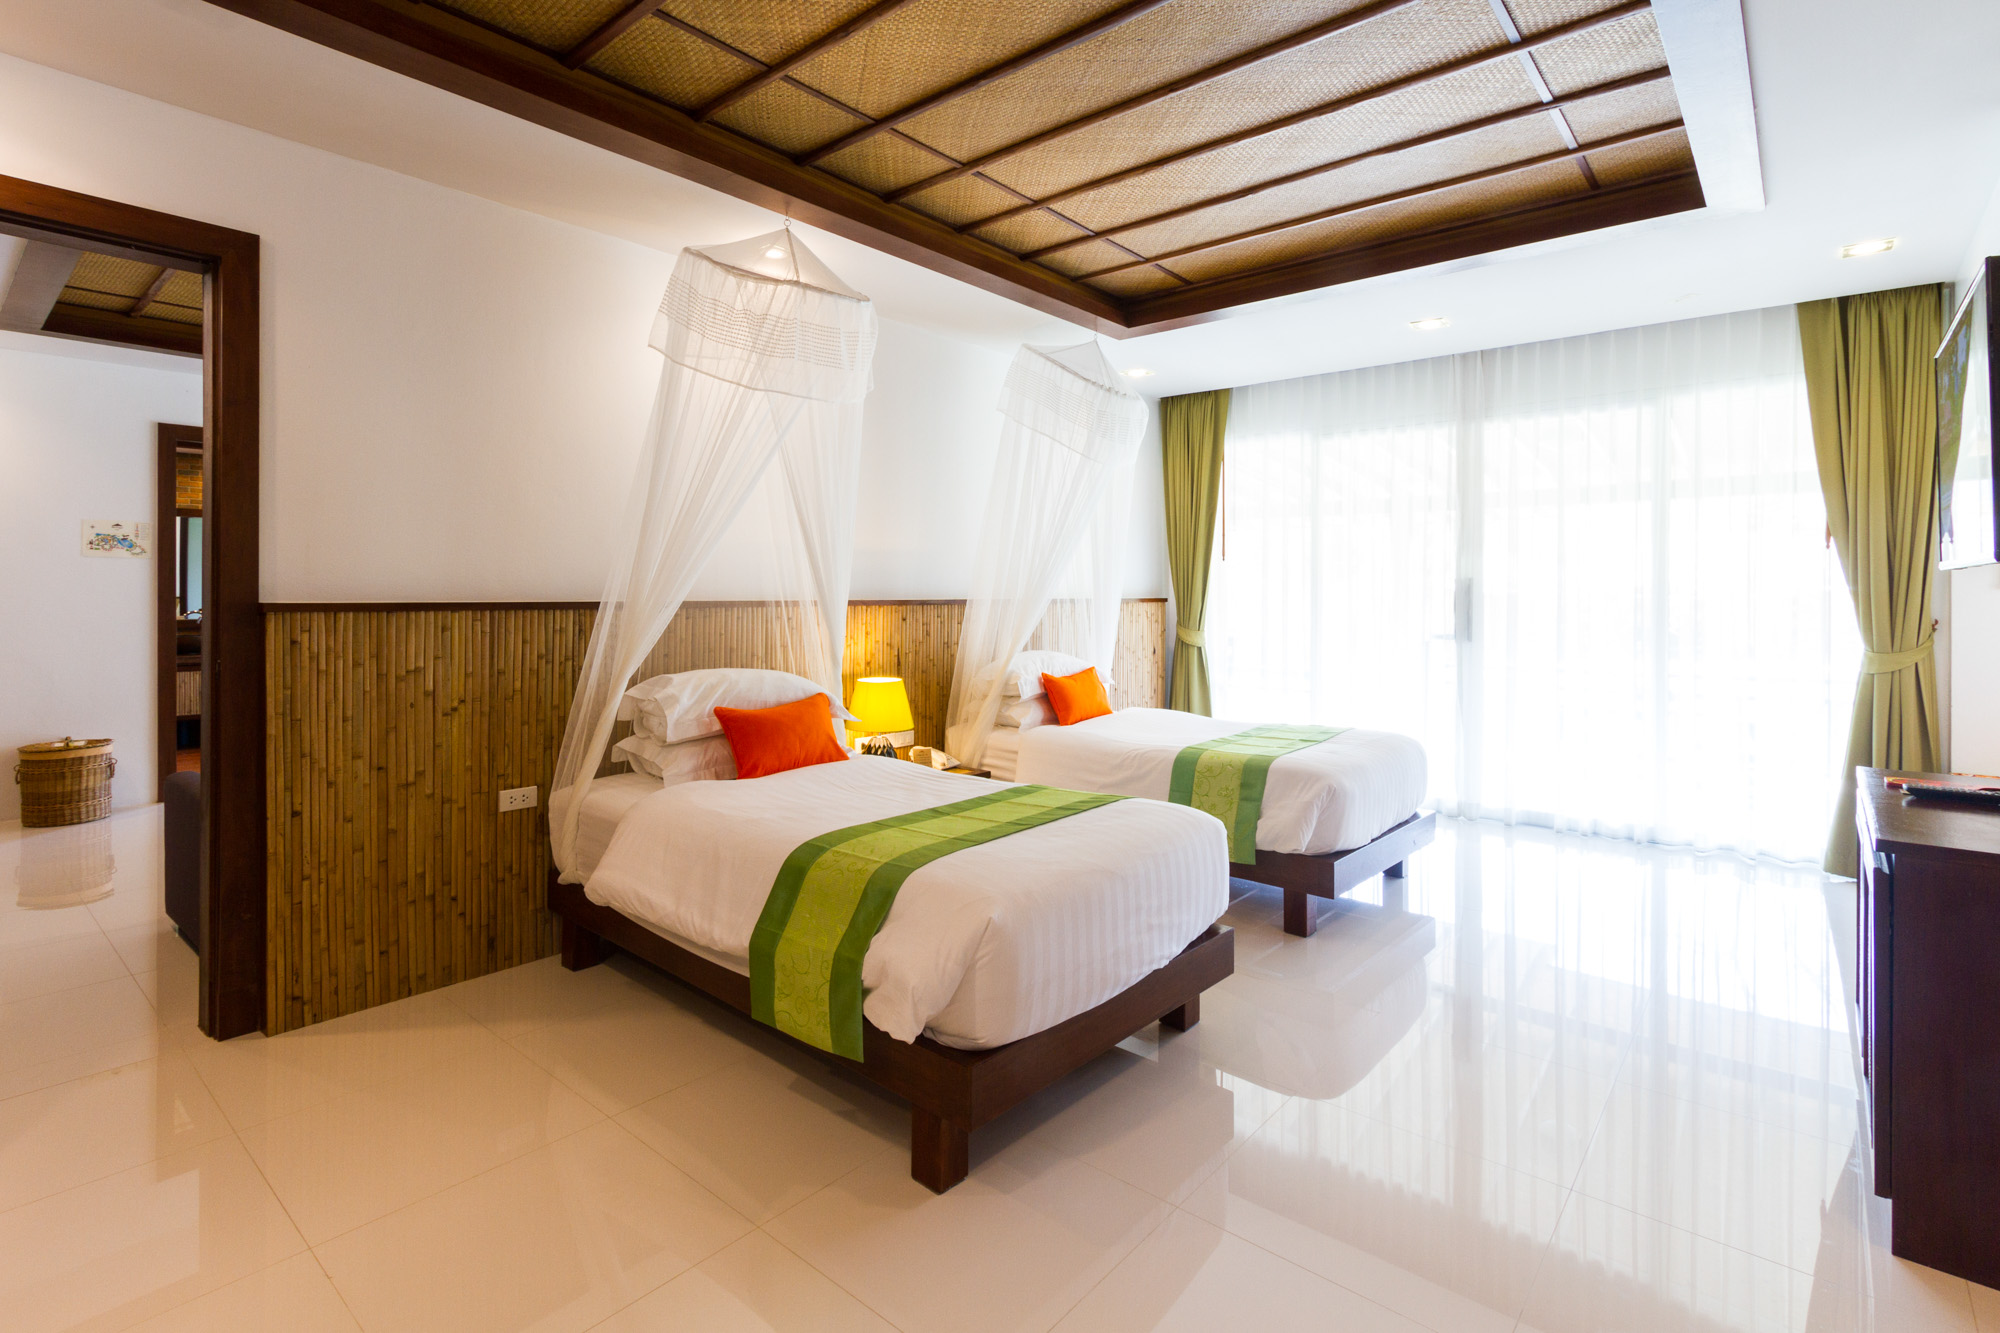 Ban Sainai Resort Krabi - Special Rates in Ao Nang  บ้านใสใน รีสอร์ท Ban Sainai Resort อ่าวนาง กระบี่ IMG 0164